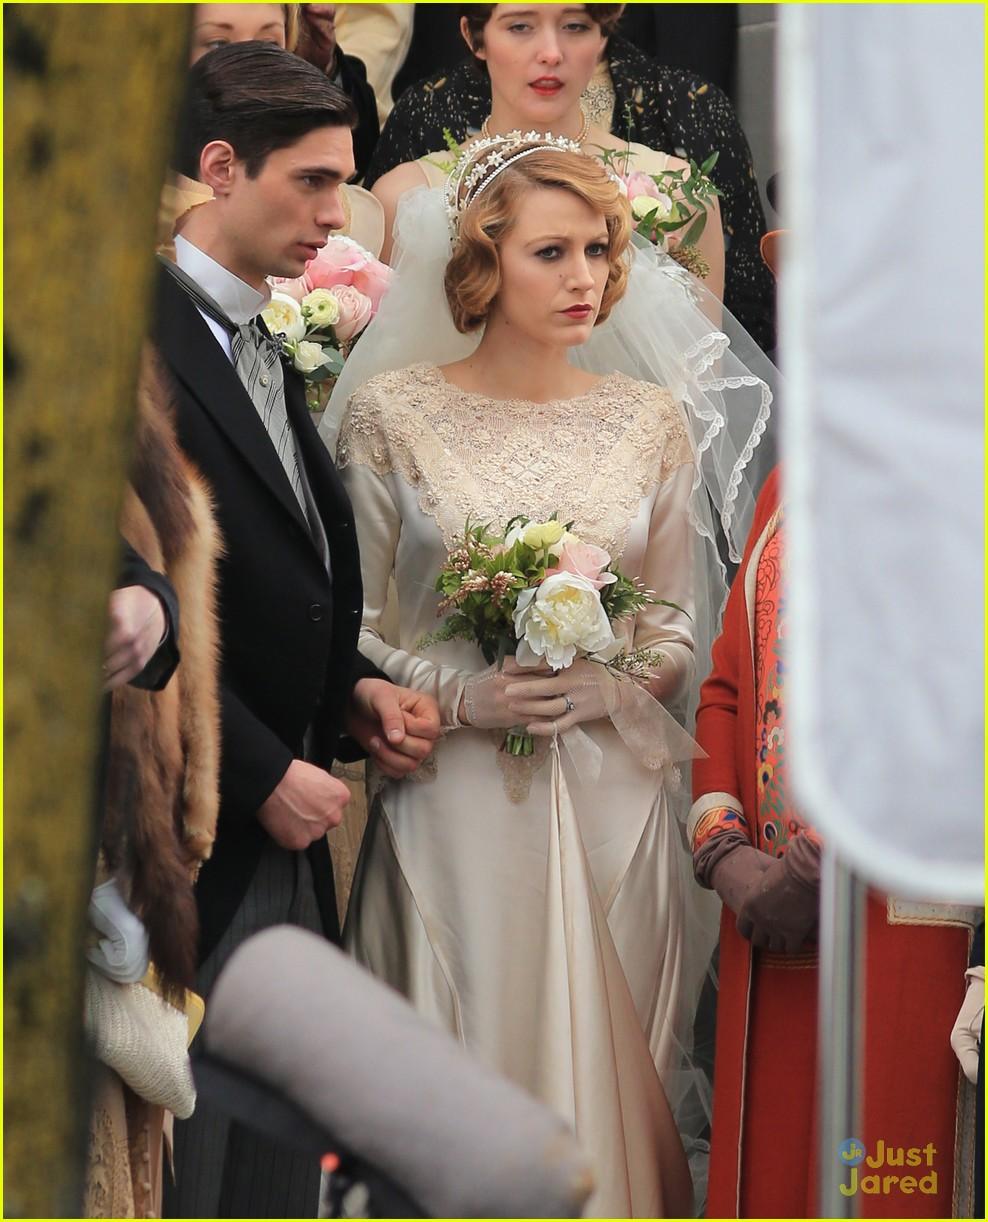 Blake Lively Wedding: 1000+ Images About Wedding Dresses On Pinterest